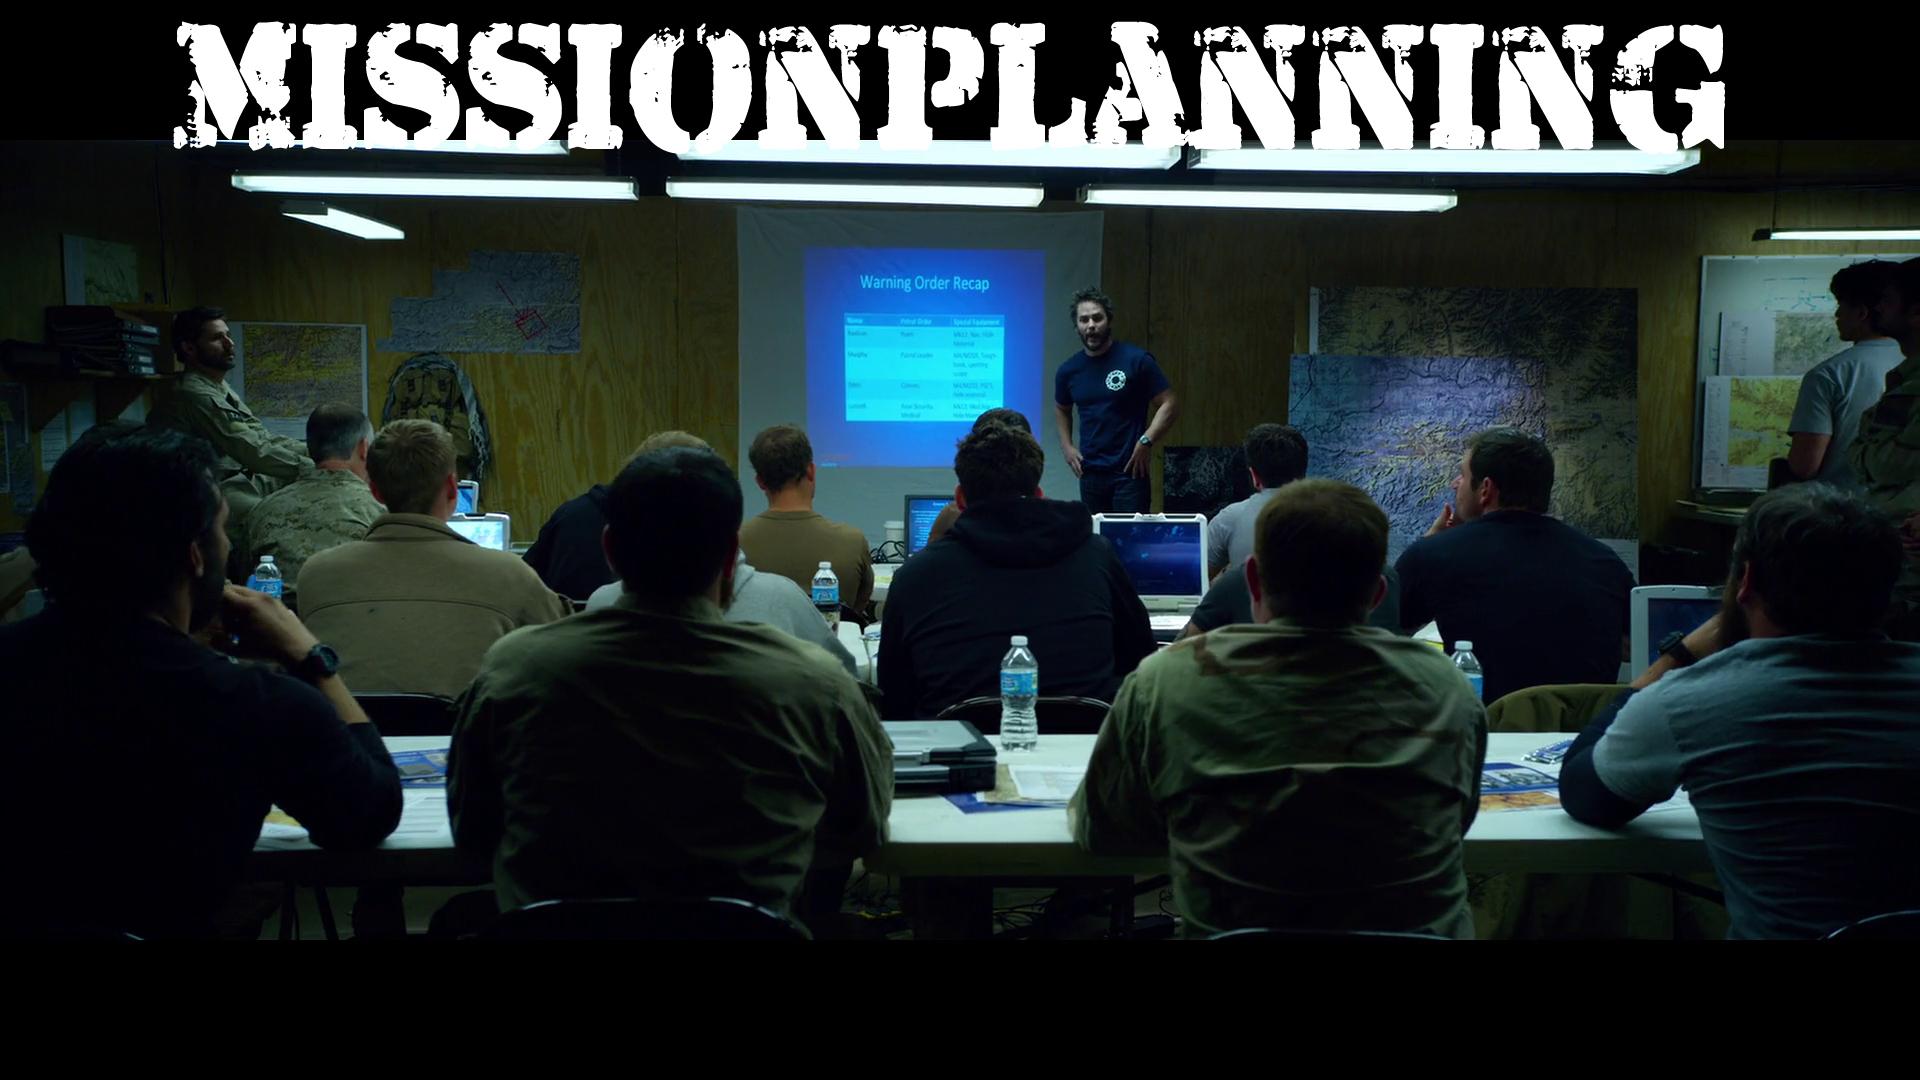 dl.dropboxusercontent.com/s/c9zgkfilsusyxr1/missionplanning.jpg